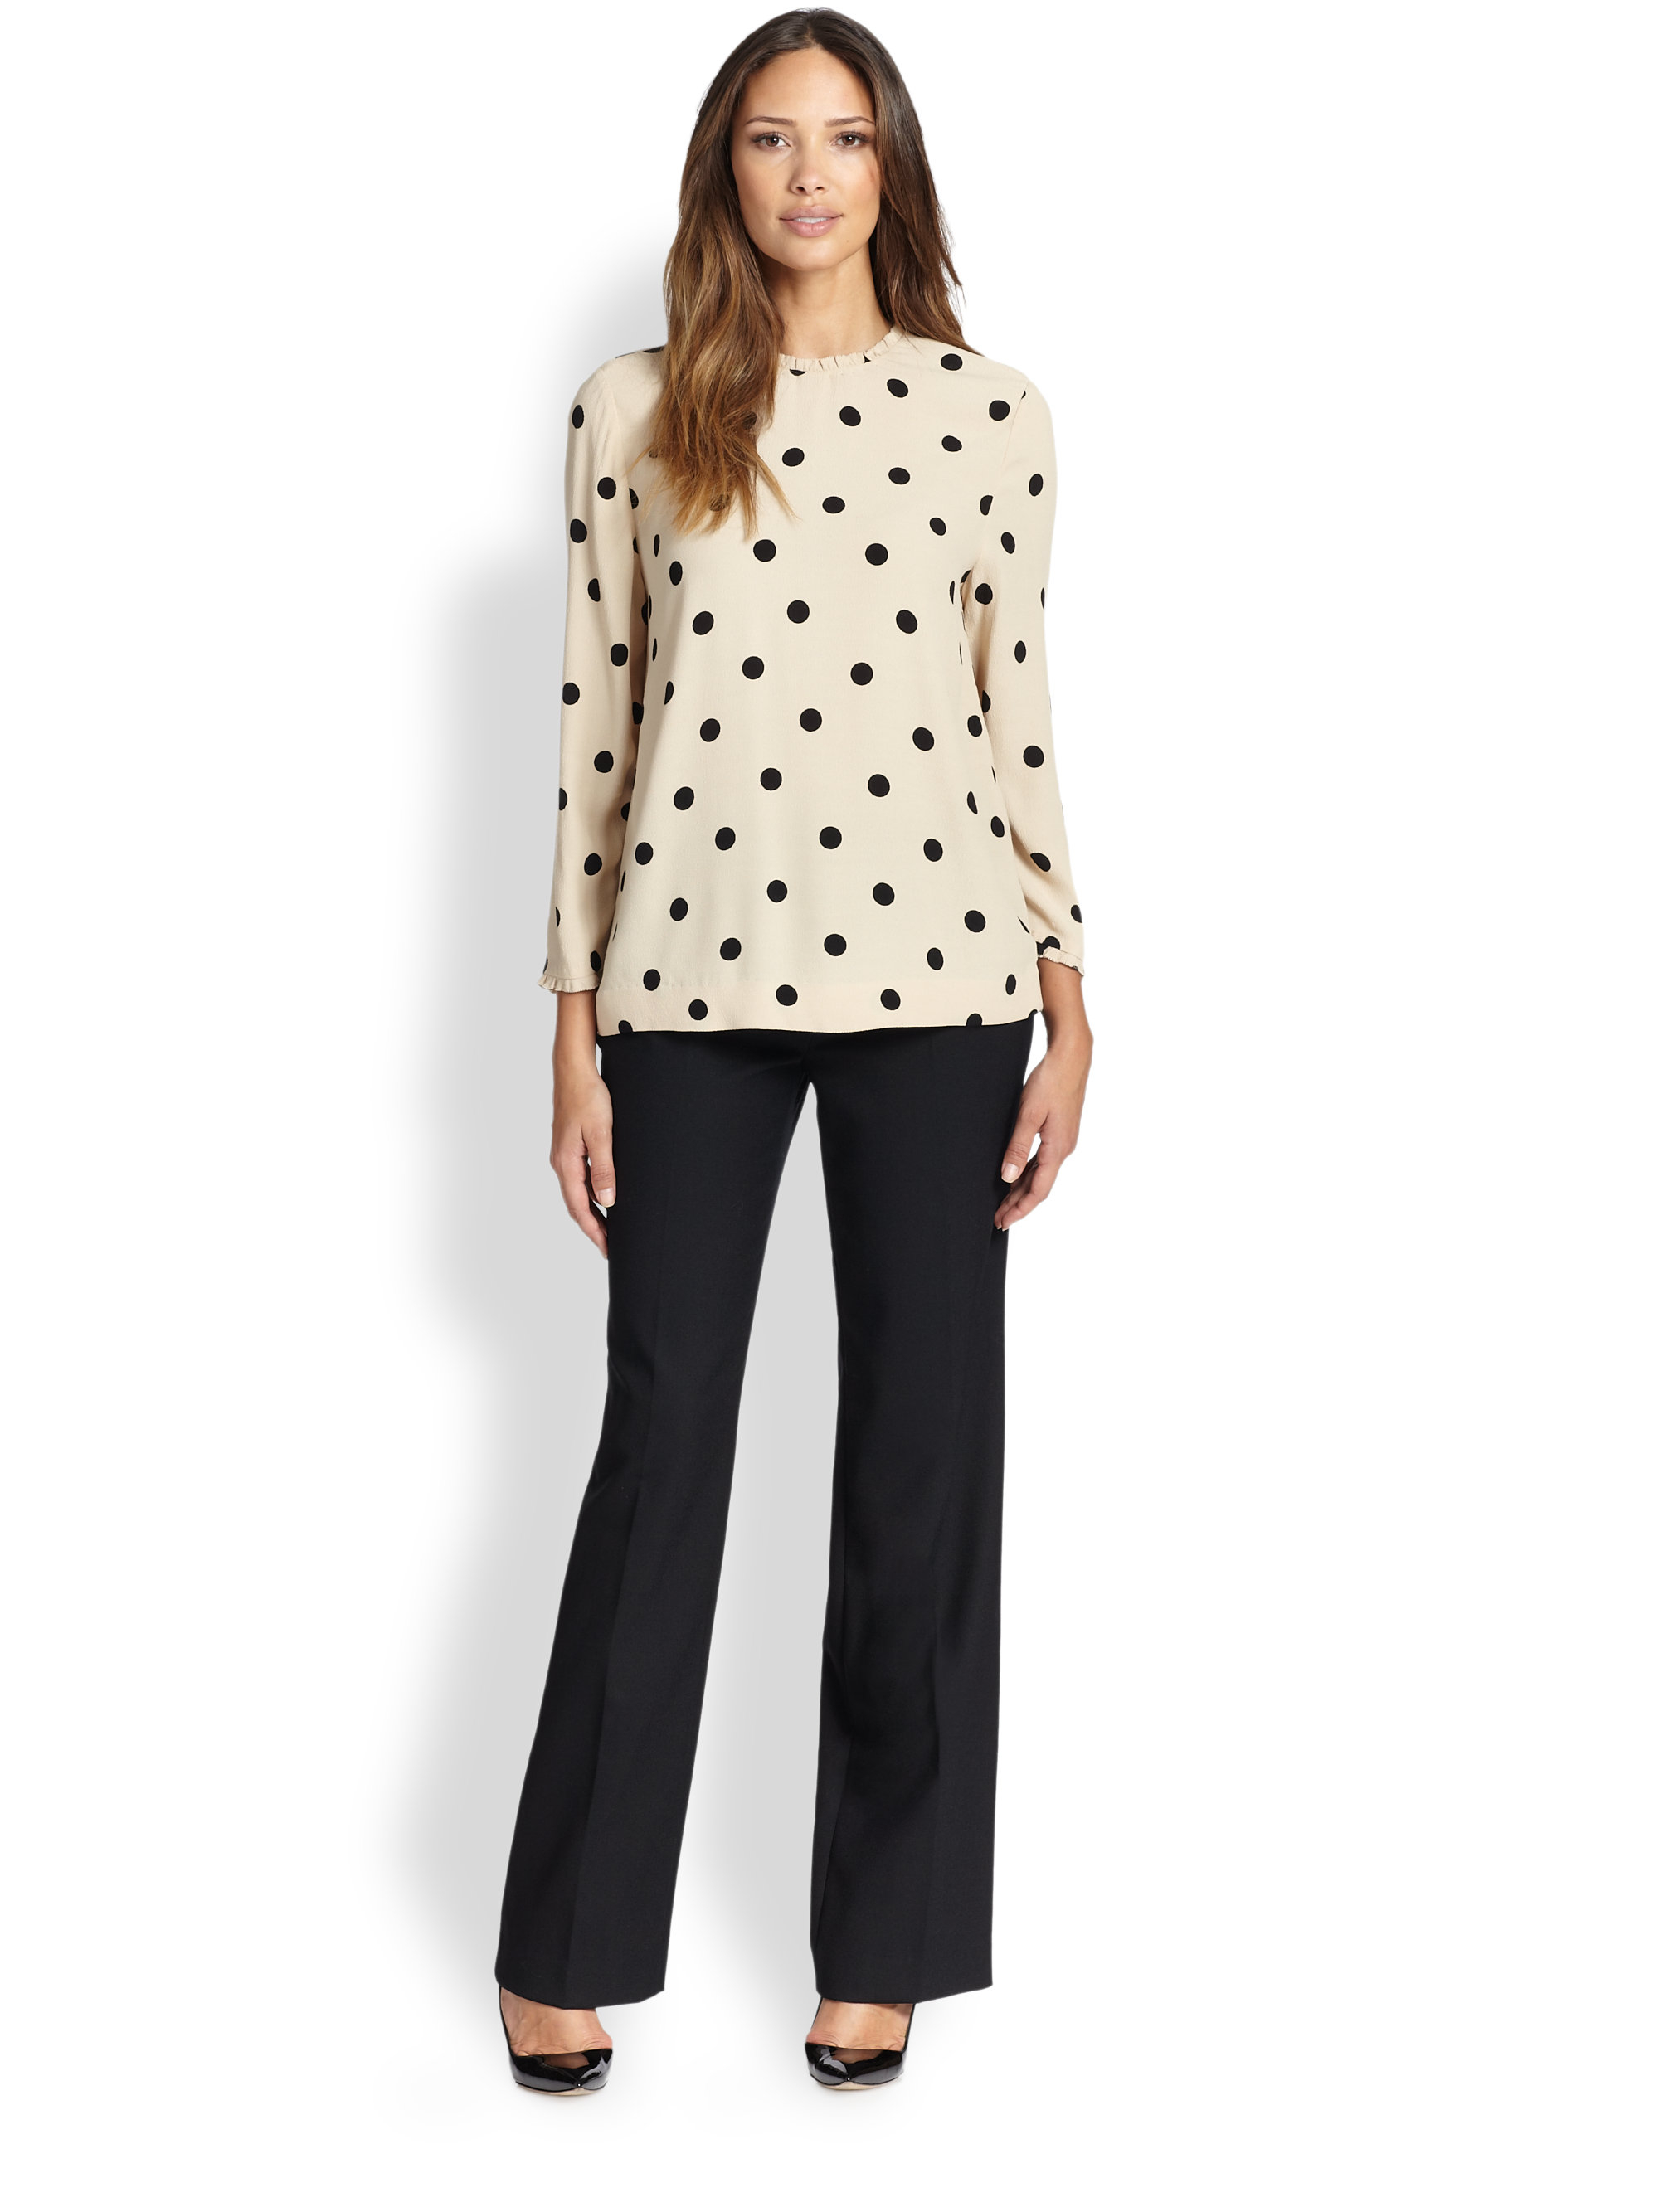 8d559d634ff Lyst - Kate Spade Deco Dot Crepe Top in Black